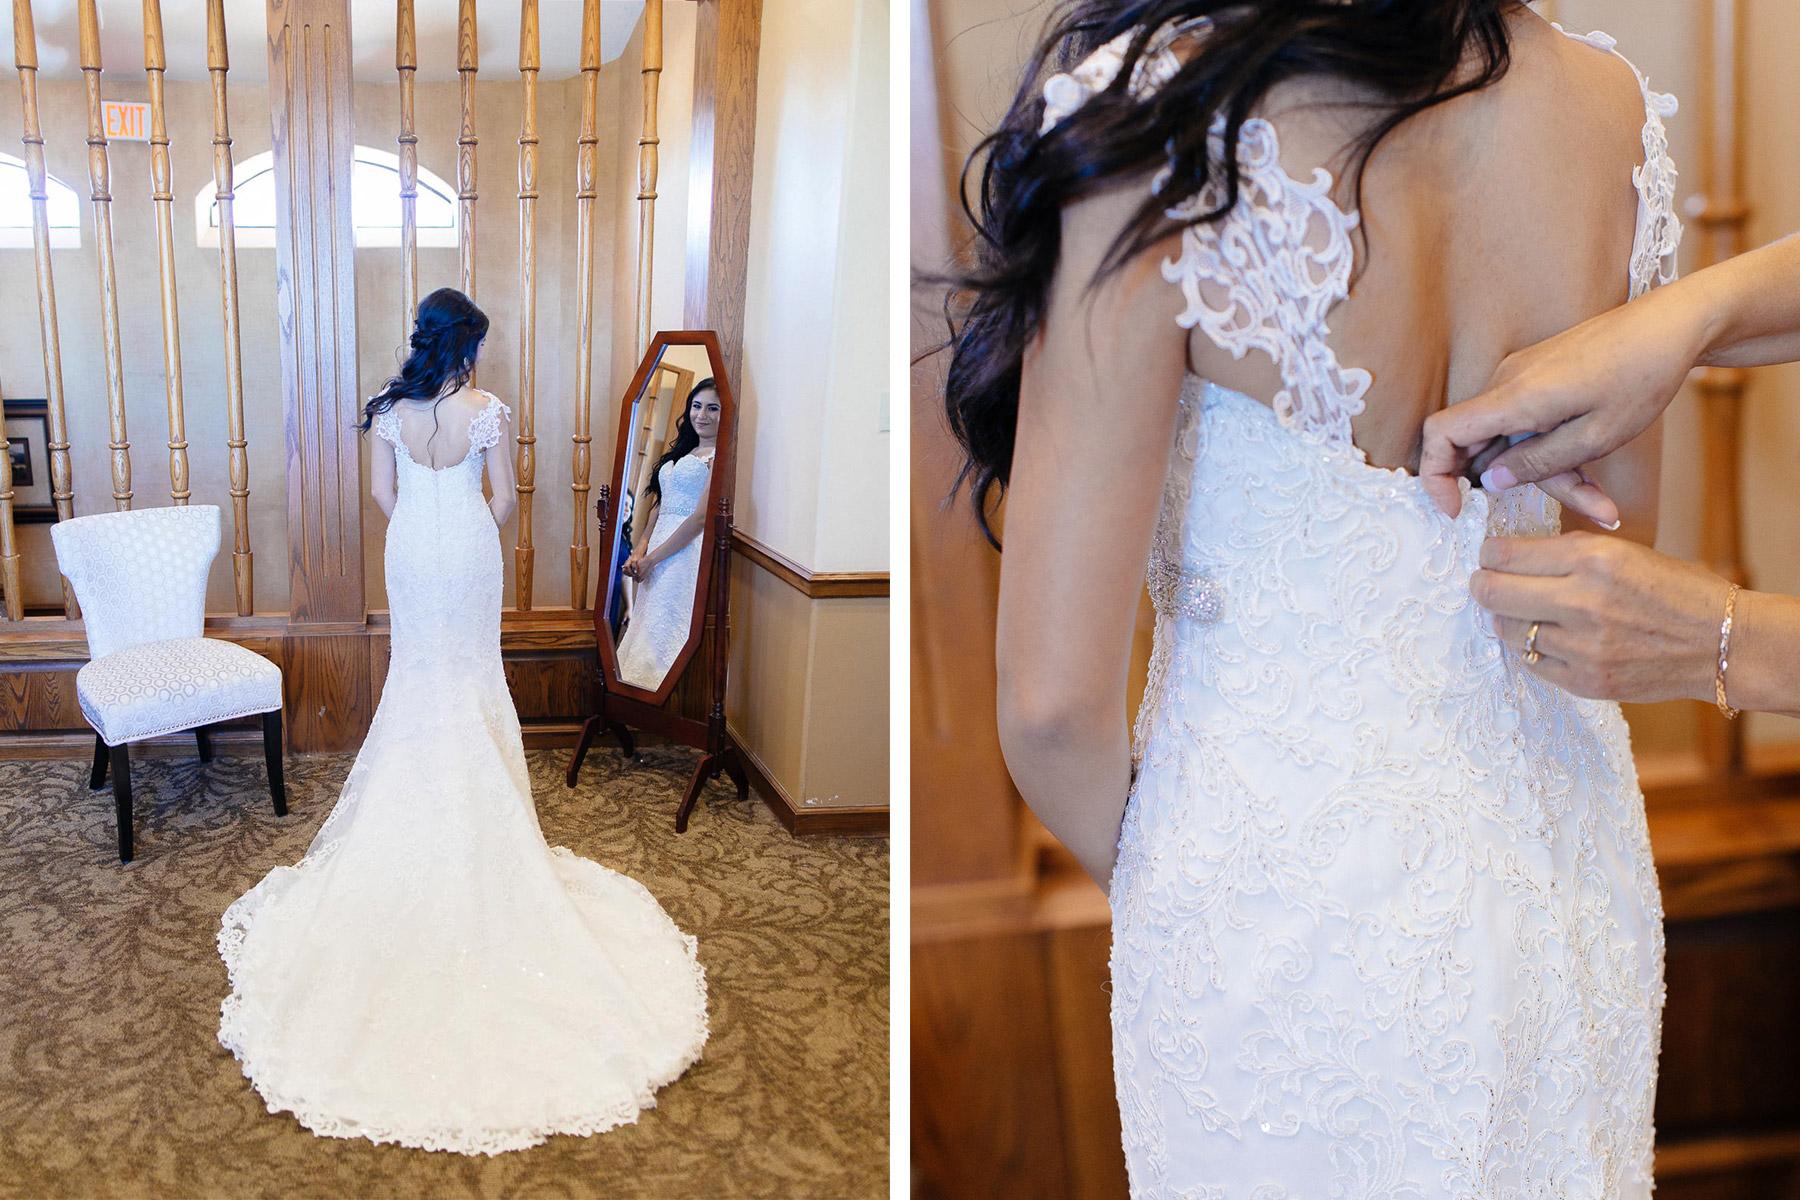 161029-Luxium-Weddings-Arizona-Jeff-Griselda-First-Look-Val-Vista-Lakes-Gilber-024a.jpg